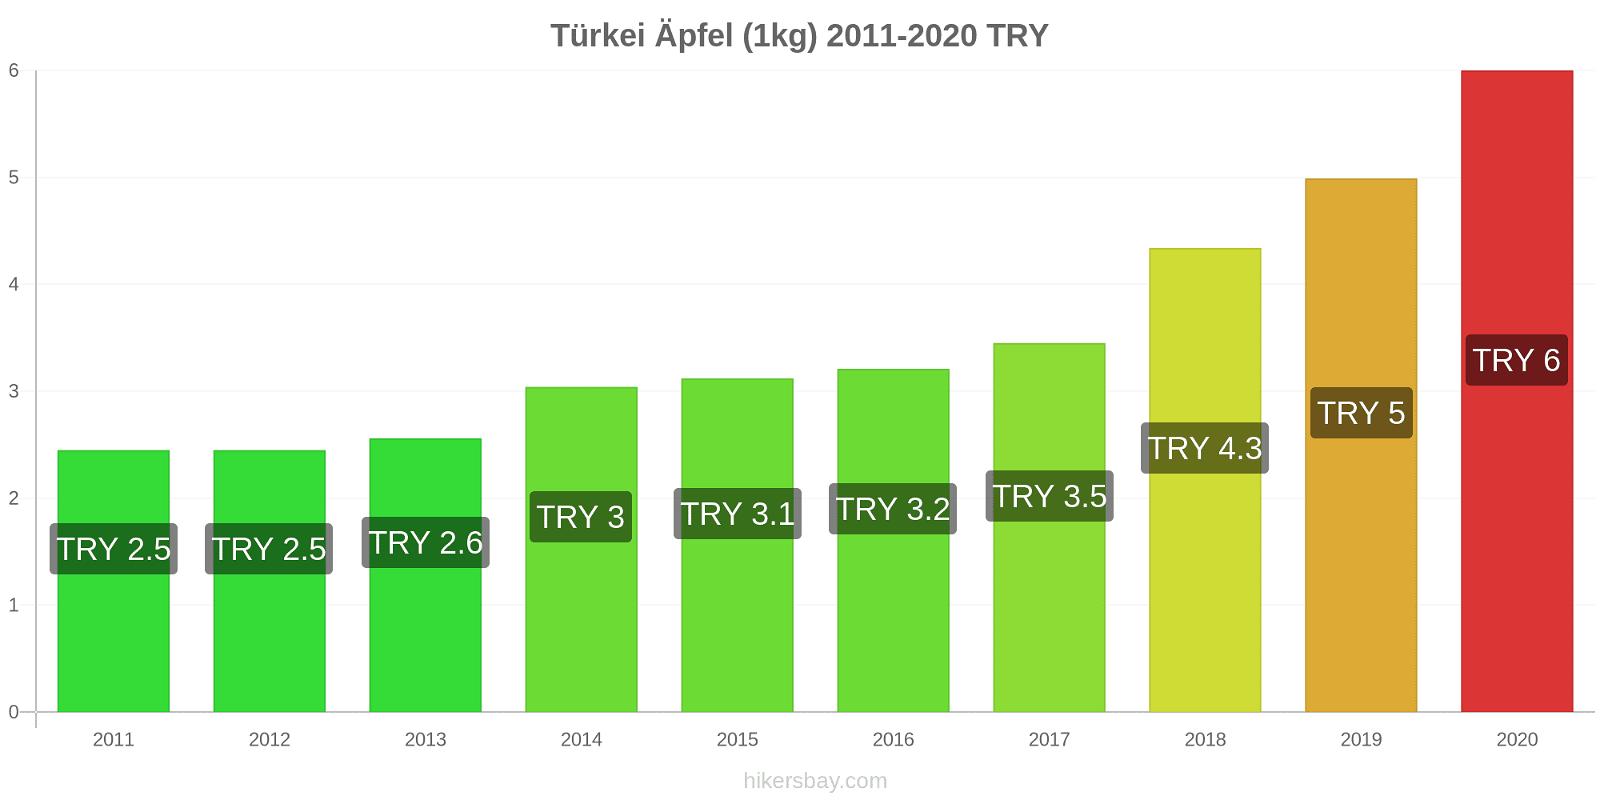 Türkei Preisänderungen Äpfel (1kg) hikersbay.com